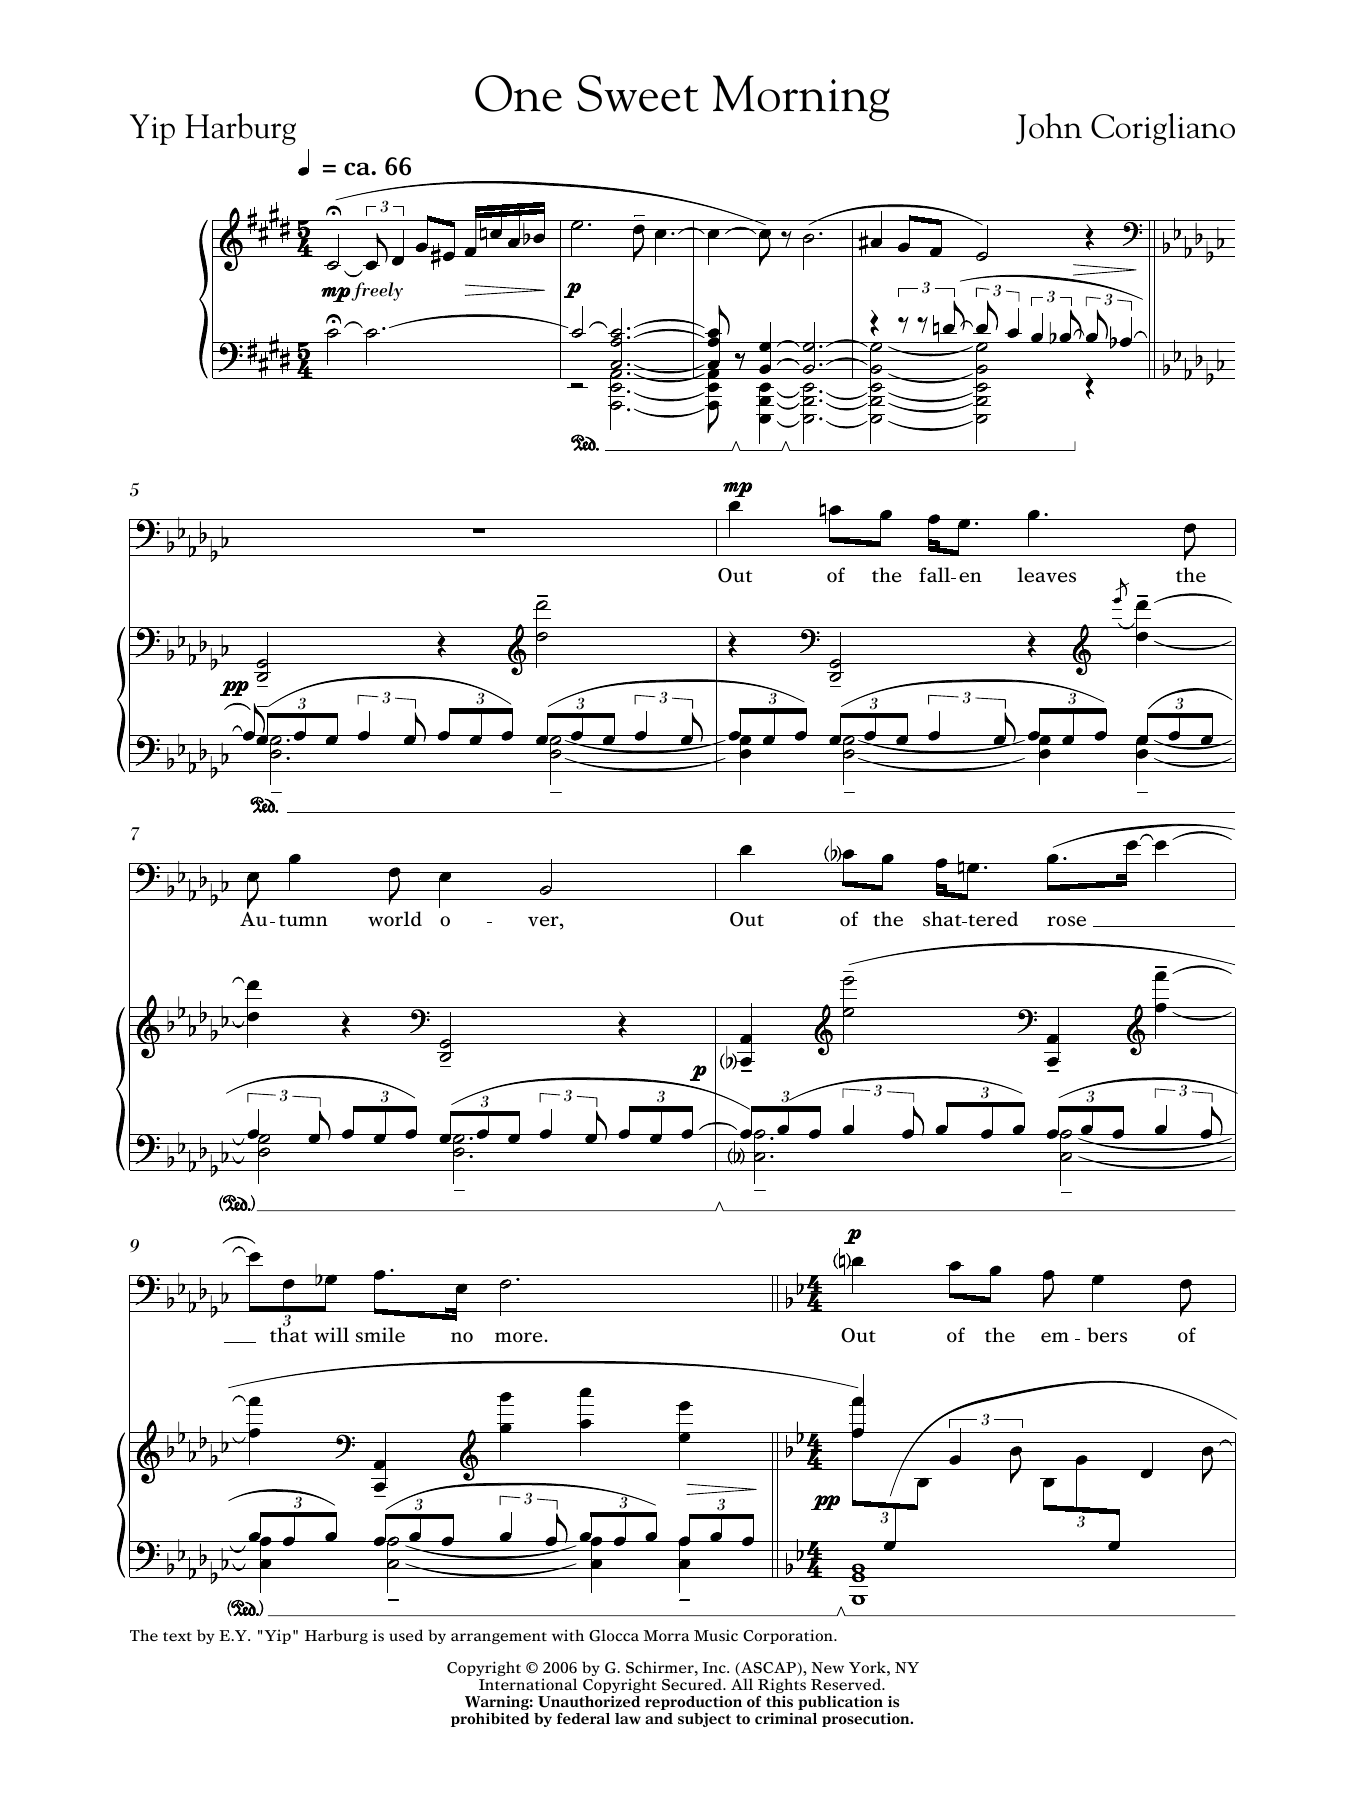 John Corigliano - One Sweet Morning (male voice)